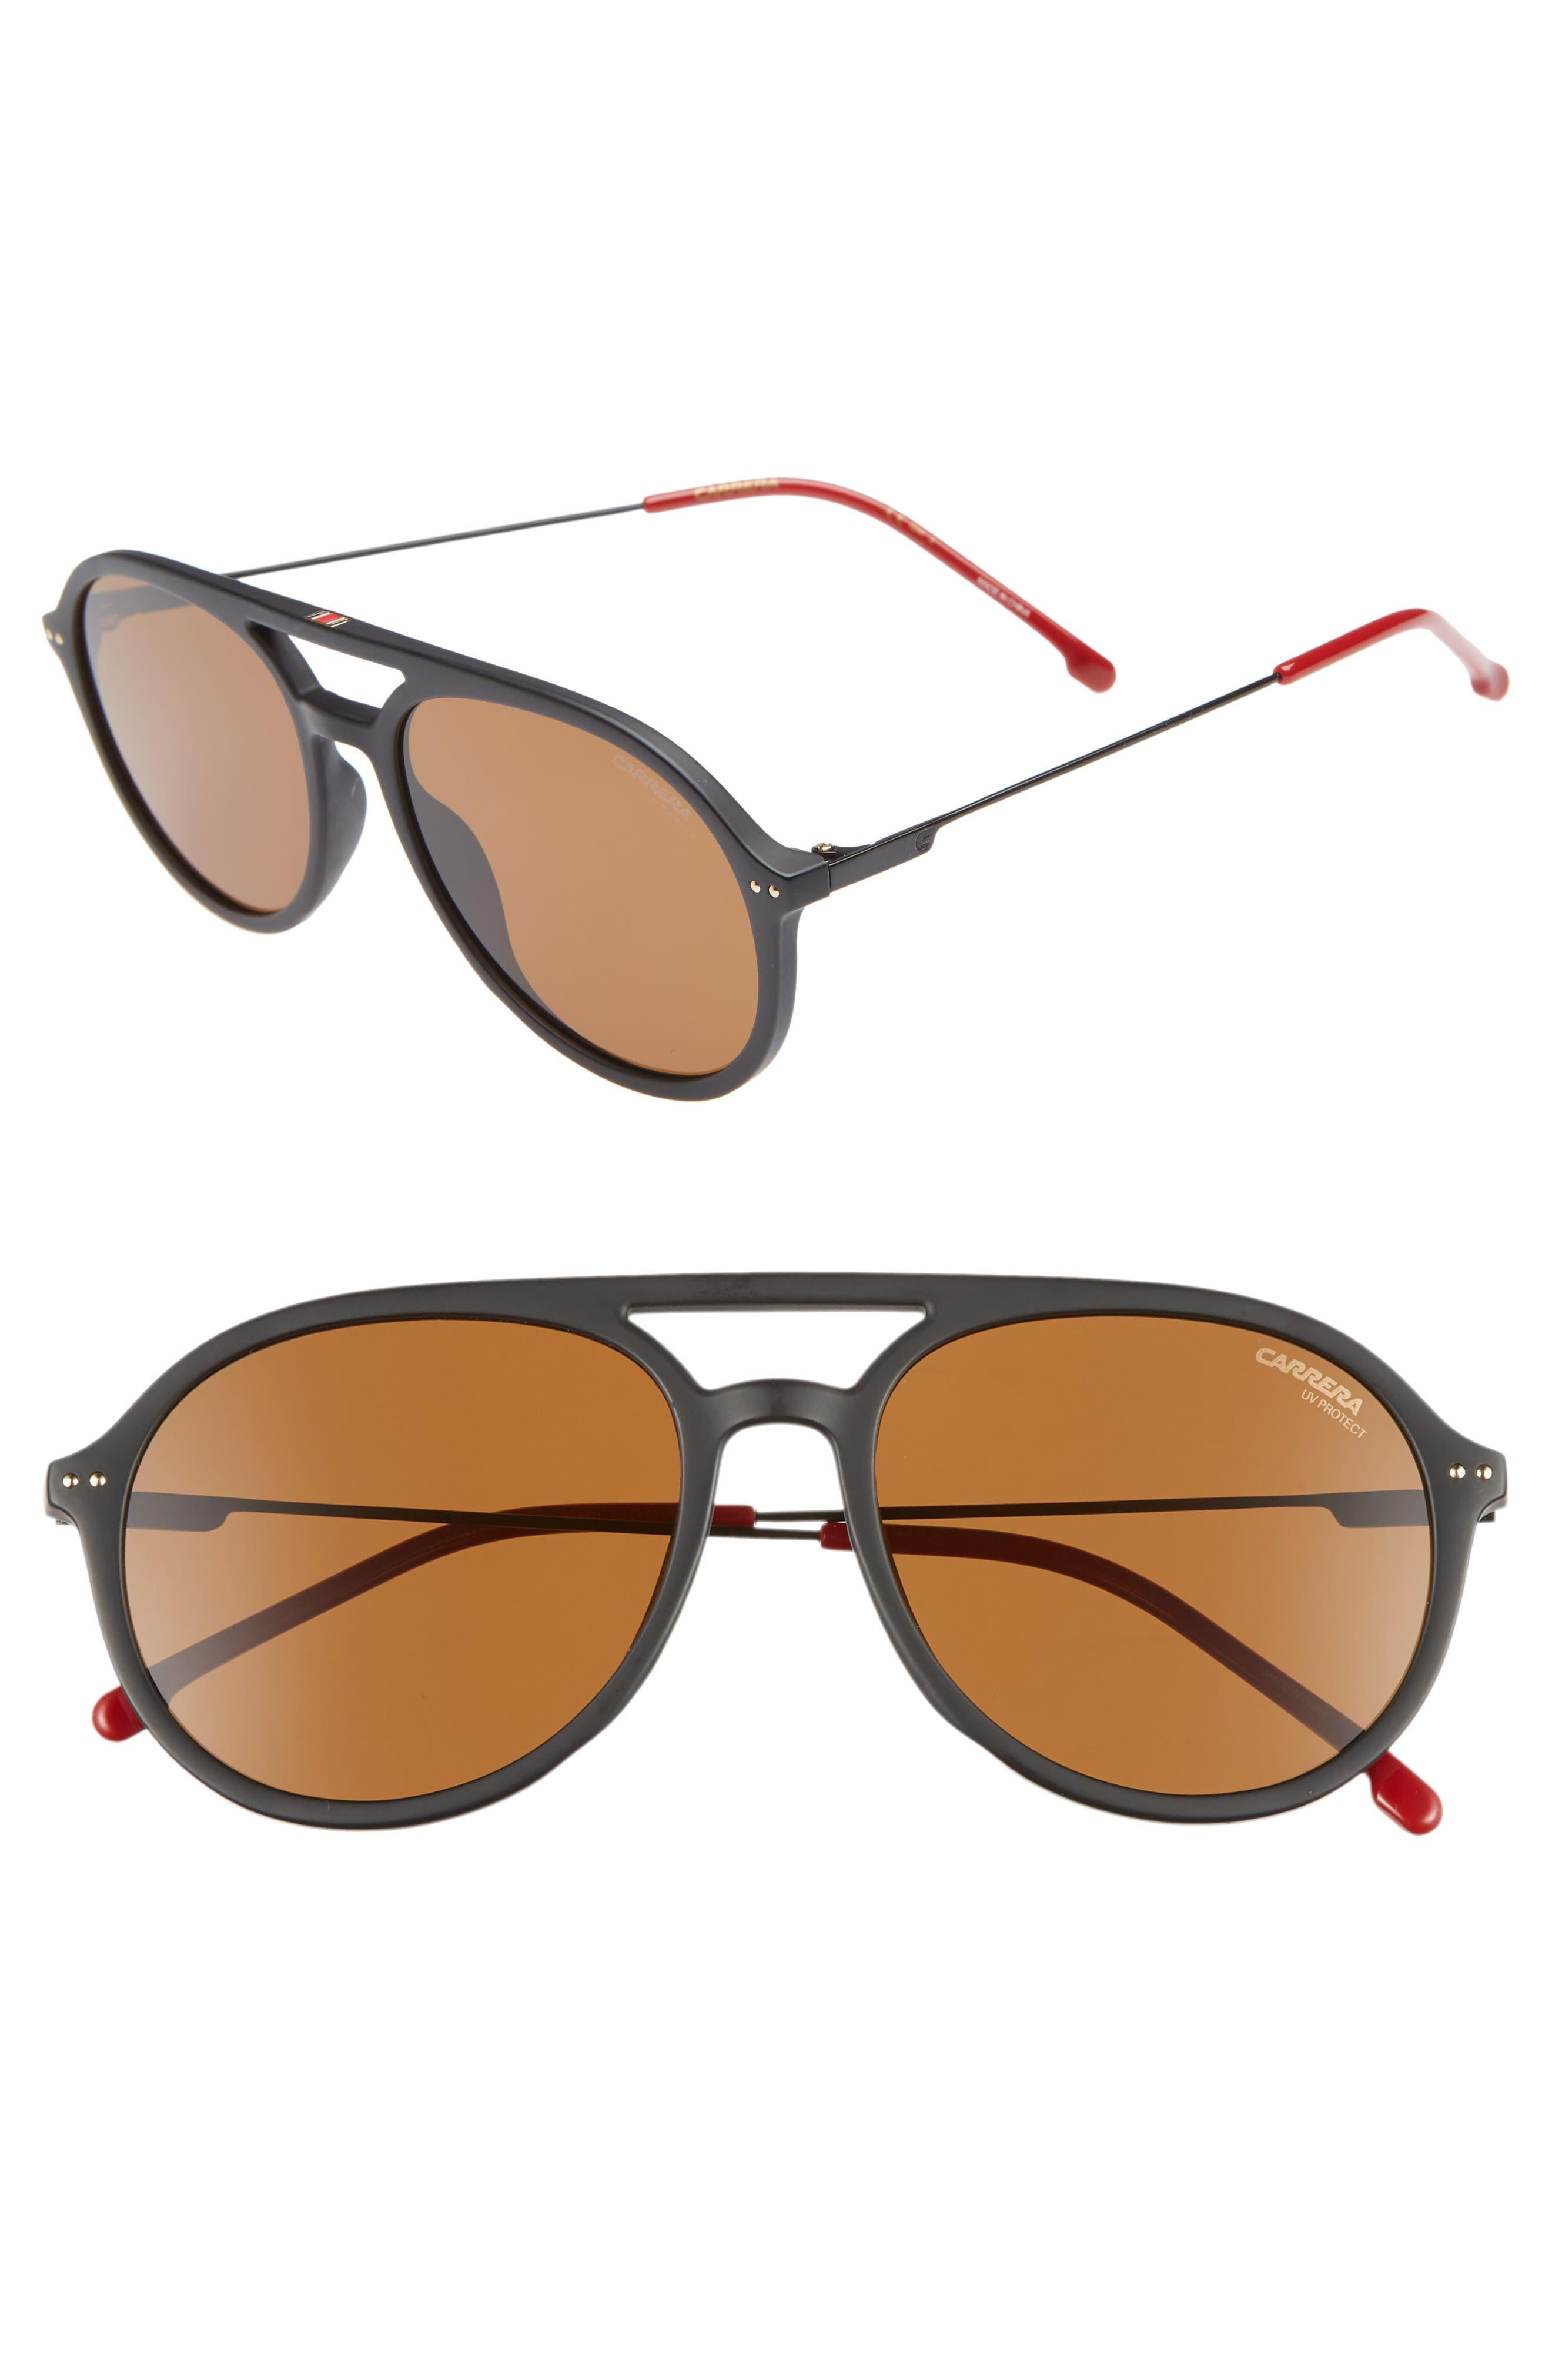 53mm Aviator Sunglasses,                             Main thumbnail 1, color,                             MATTE BLACK